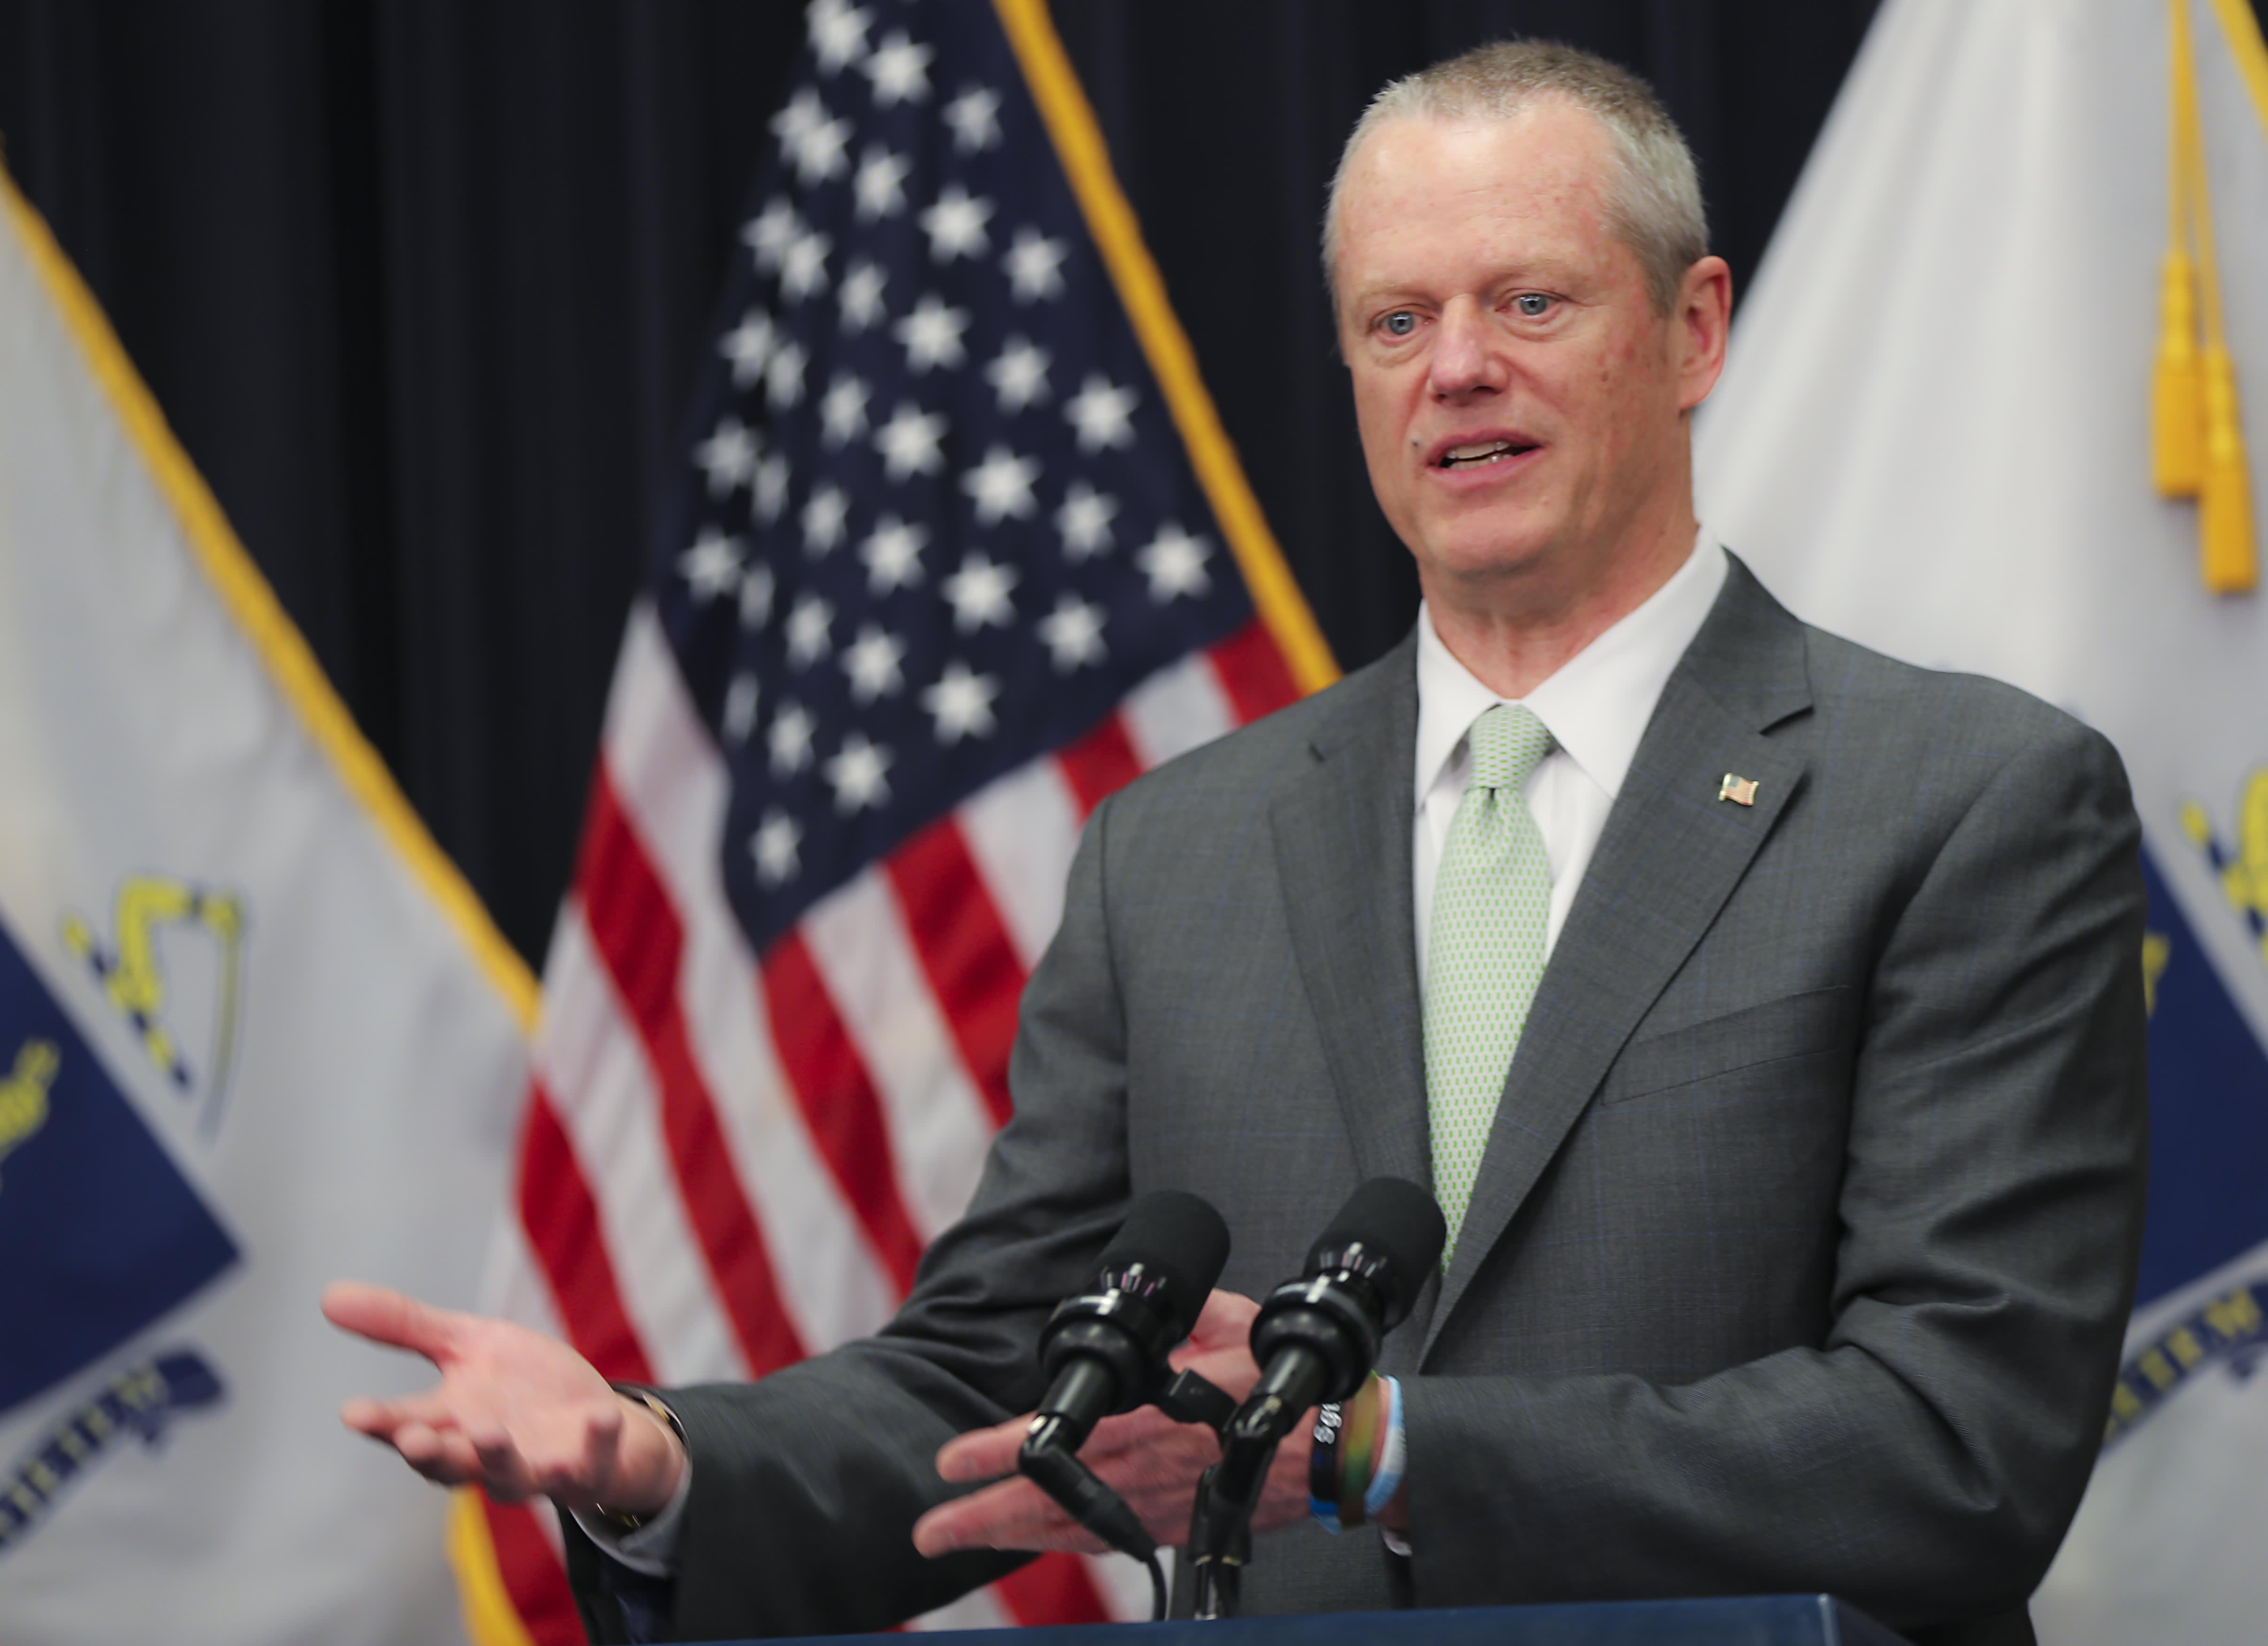 Massachusetts shutters nonessential businesses until April 7, Gov. Baker announces